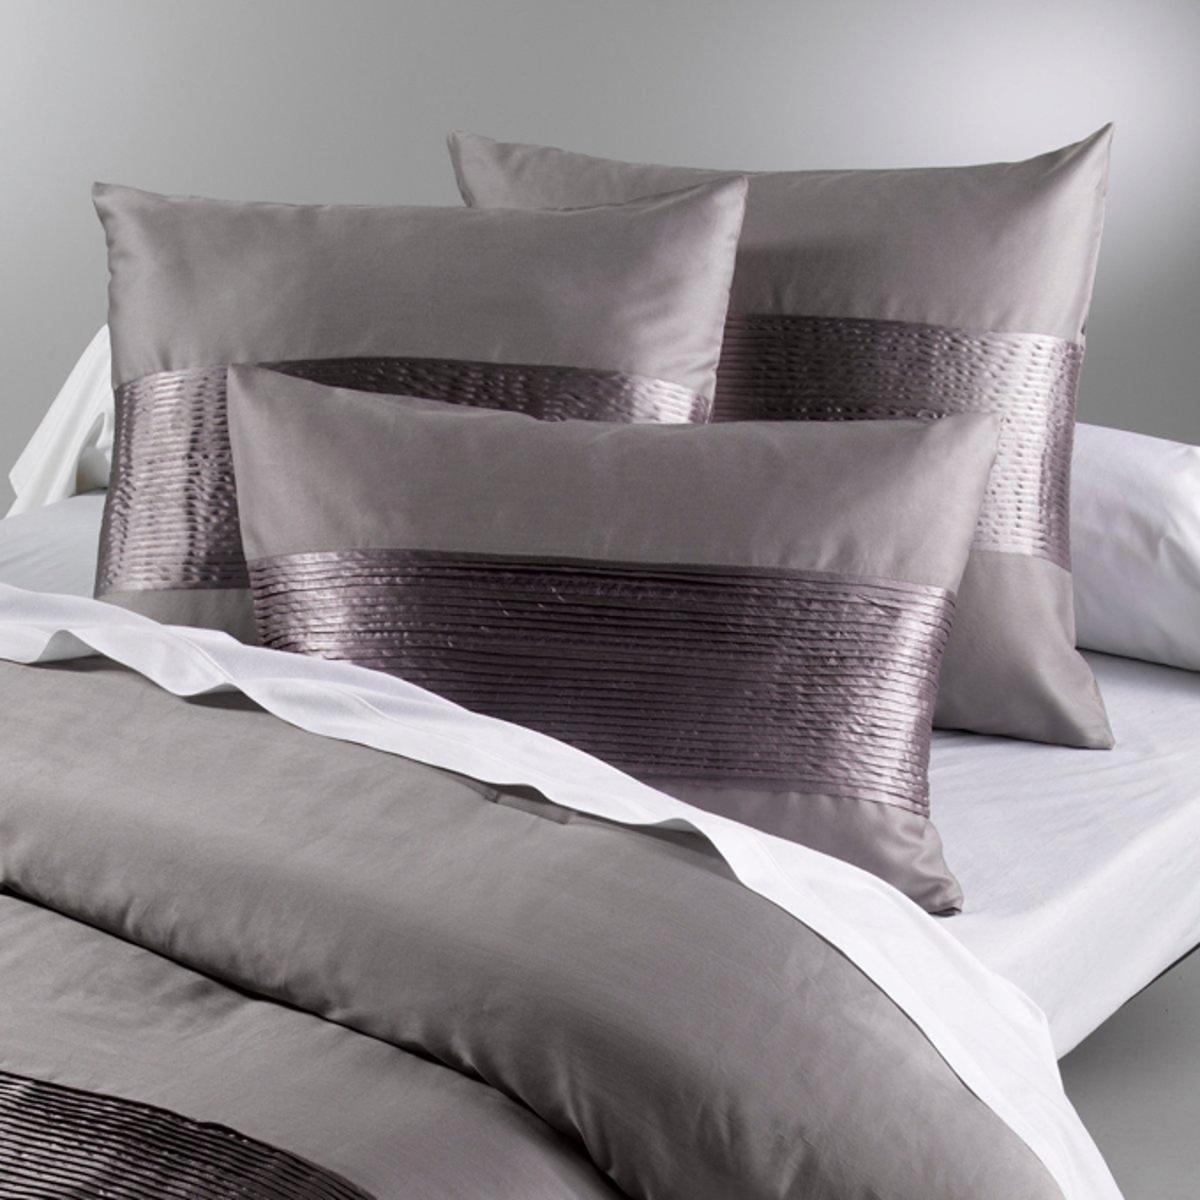 Чехол на подушку из хлопкового сатина AEMI